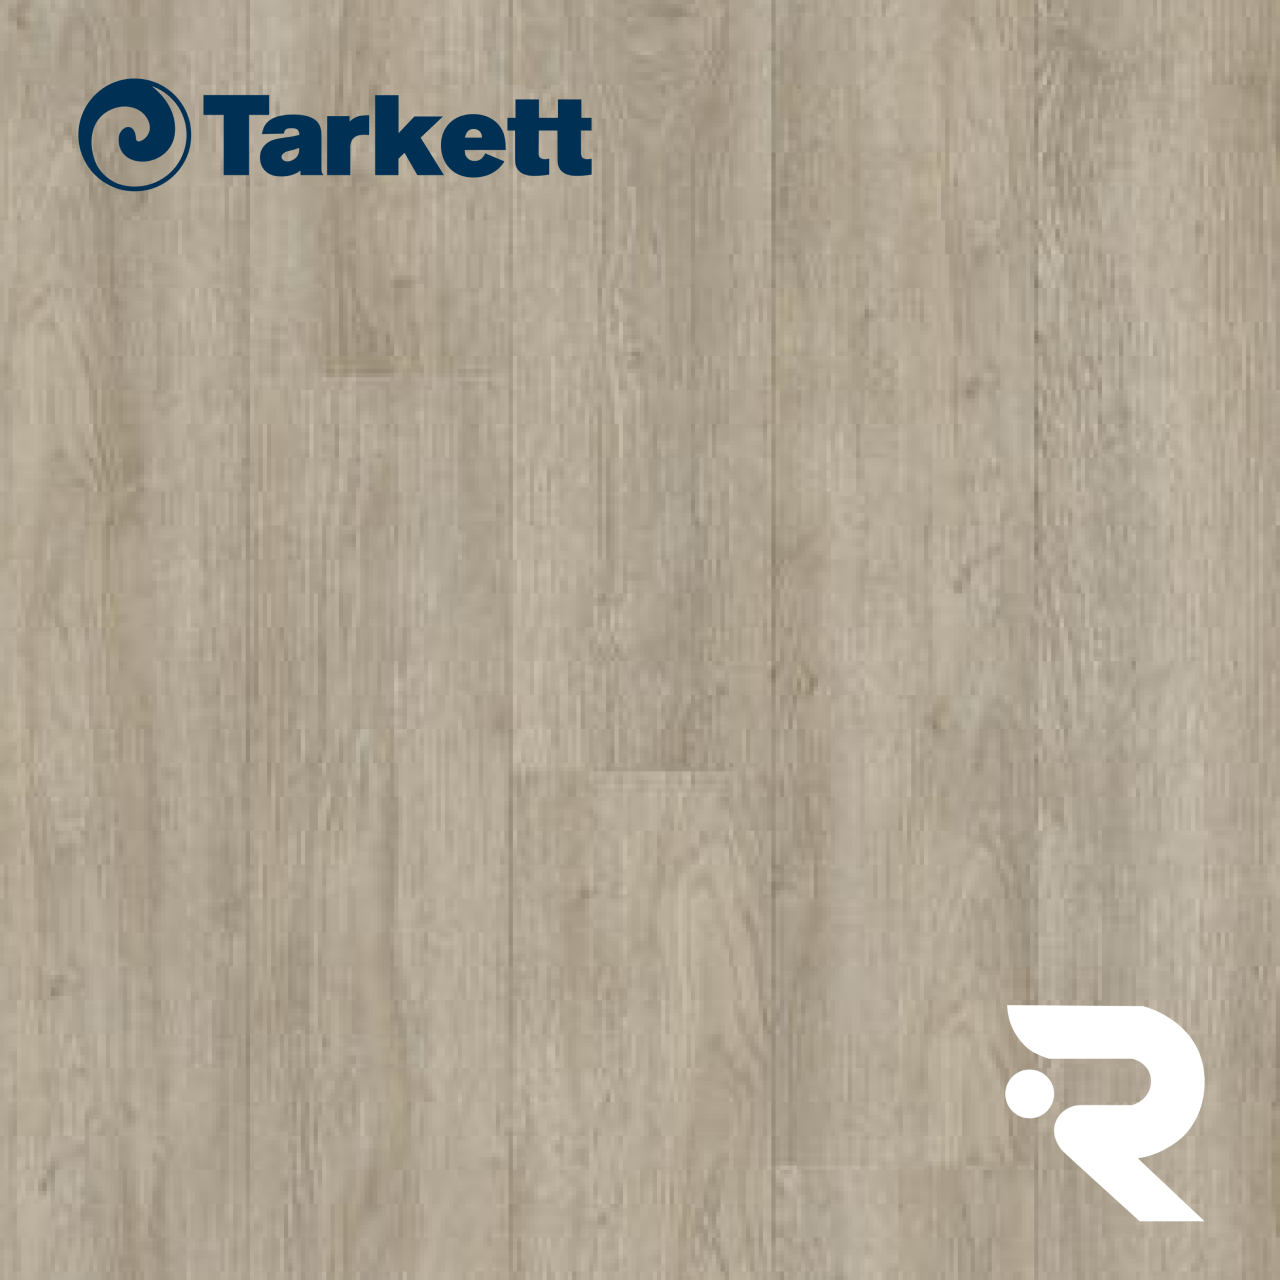 🌳 ПВХ плитка Tarkett   ModularT 7 - OAK TREND SAND   Art Vinyl   1200 x 200 мм